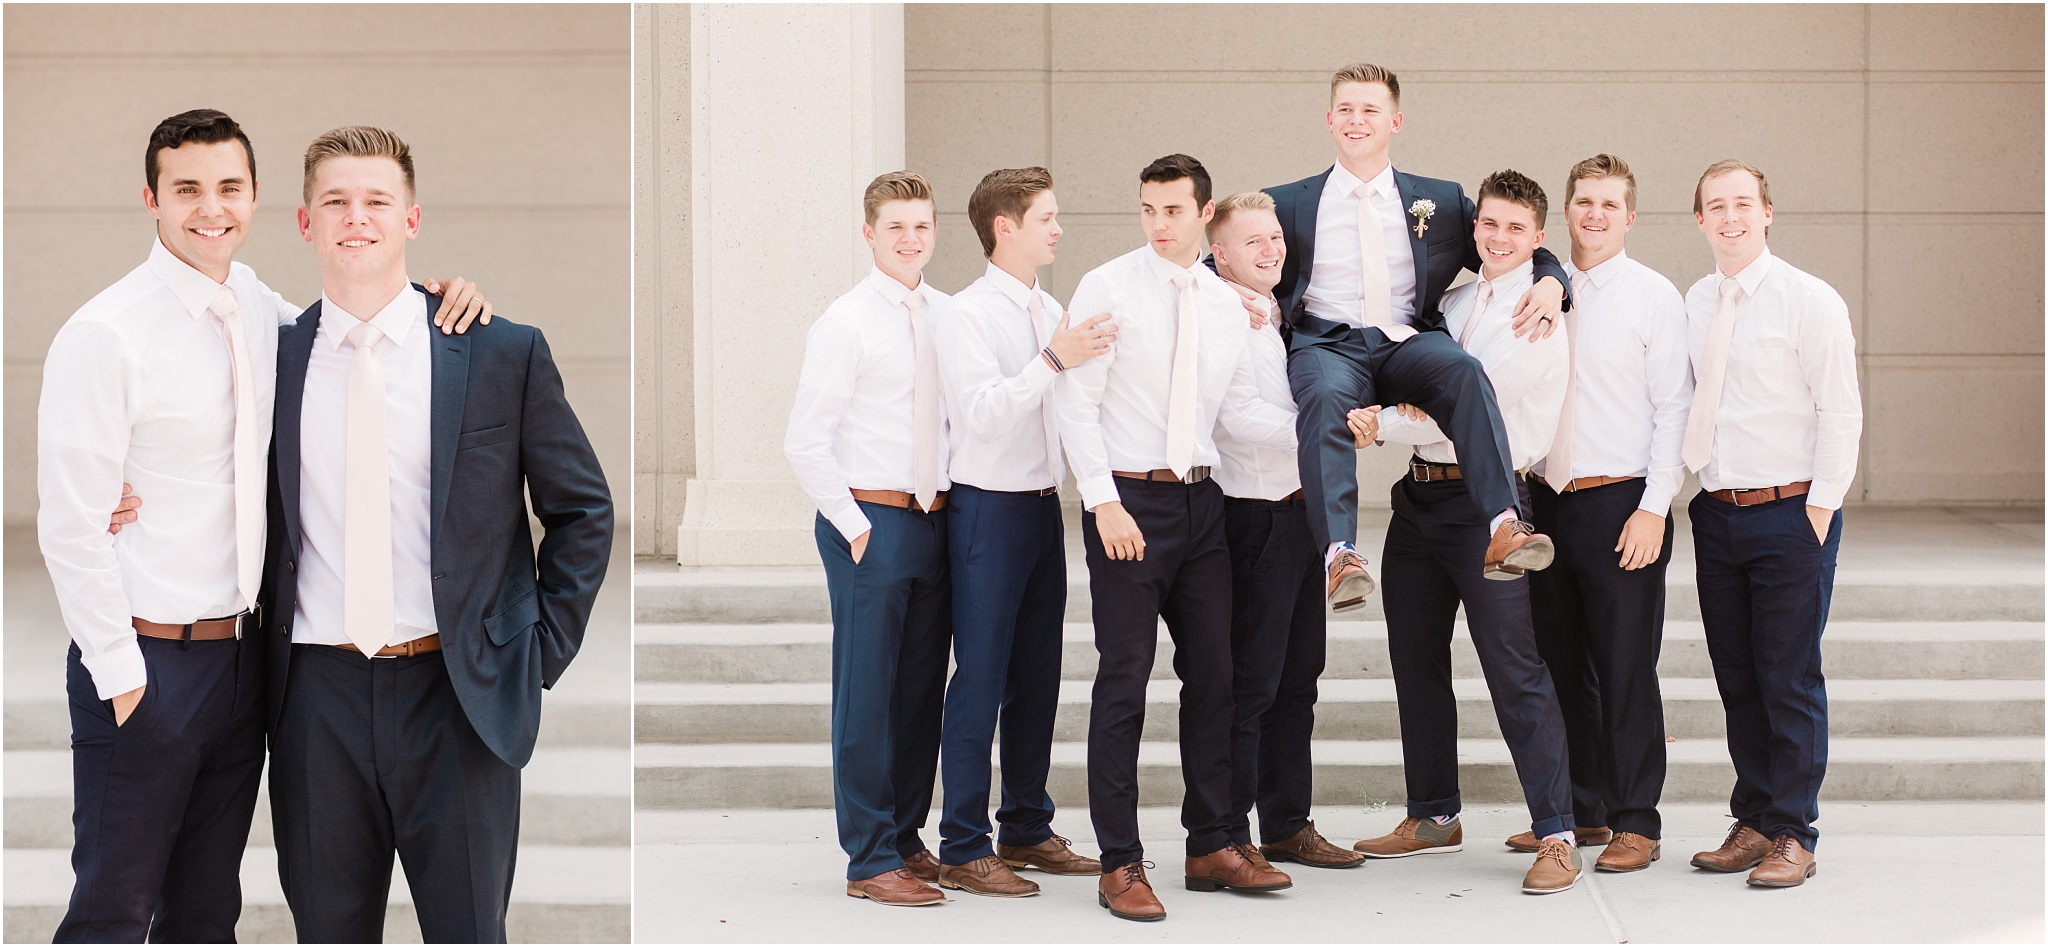 Wedding Photography_Meridian Idaho Temple_Boise Idaho_Nampa Idaho_Leah Southwick Photography_0045.jpg